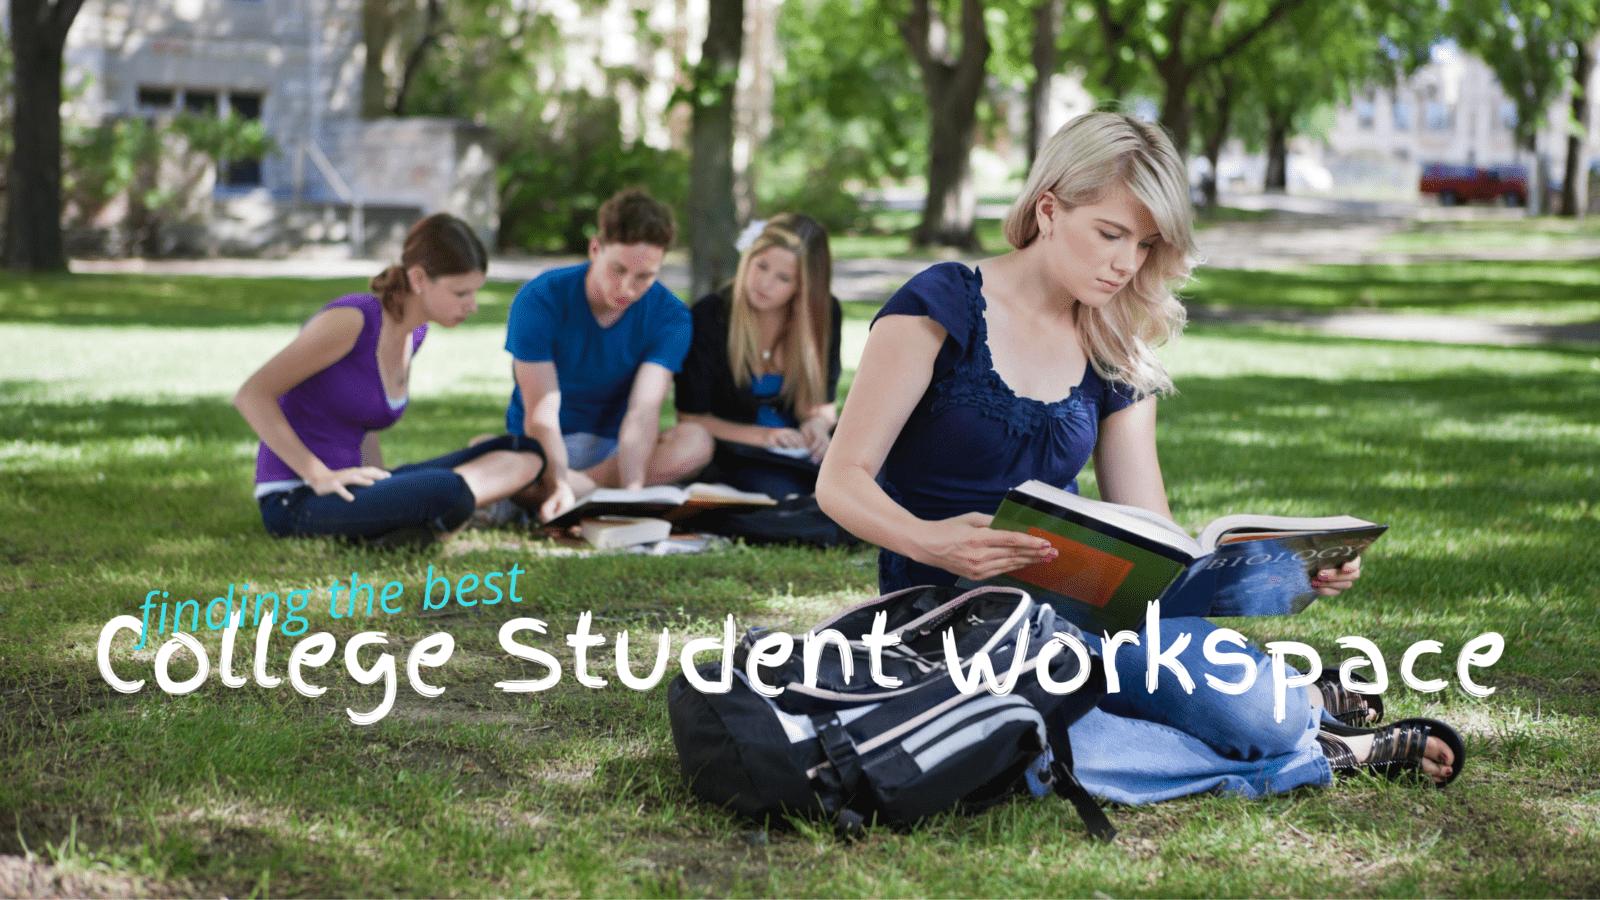 College Student Workspace